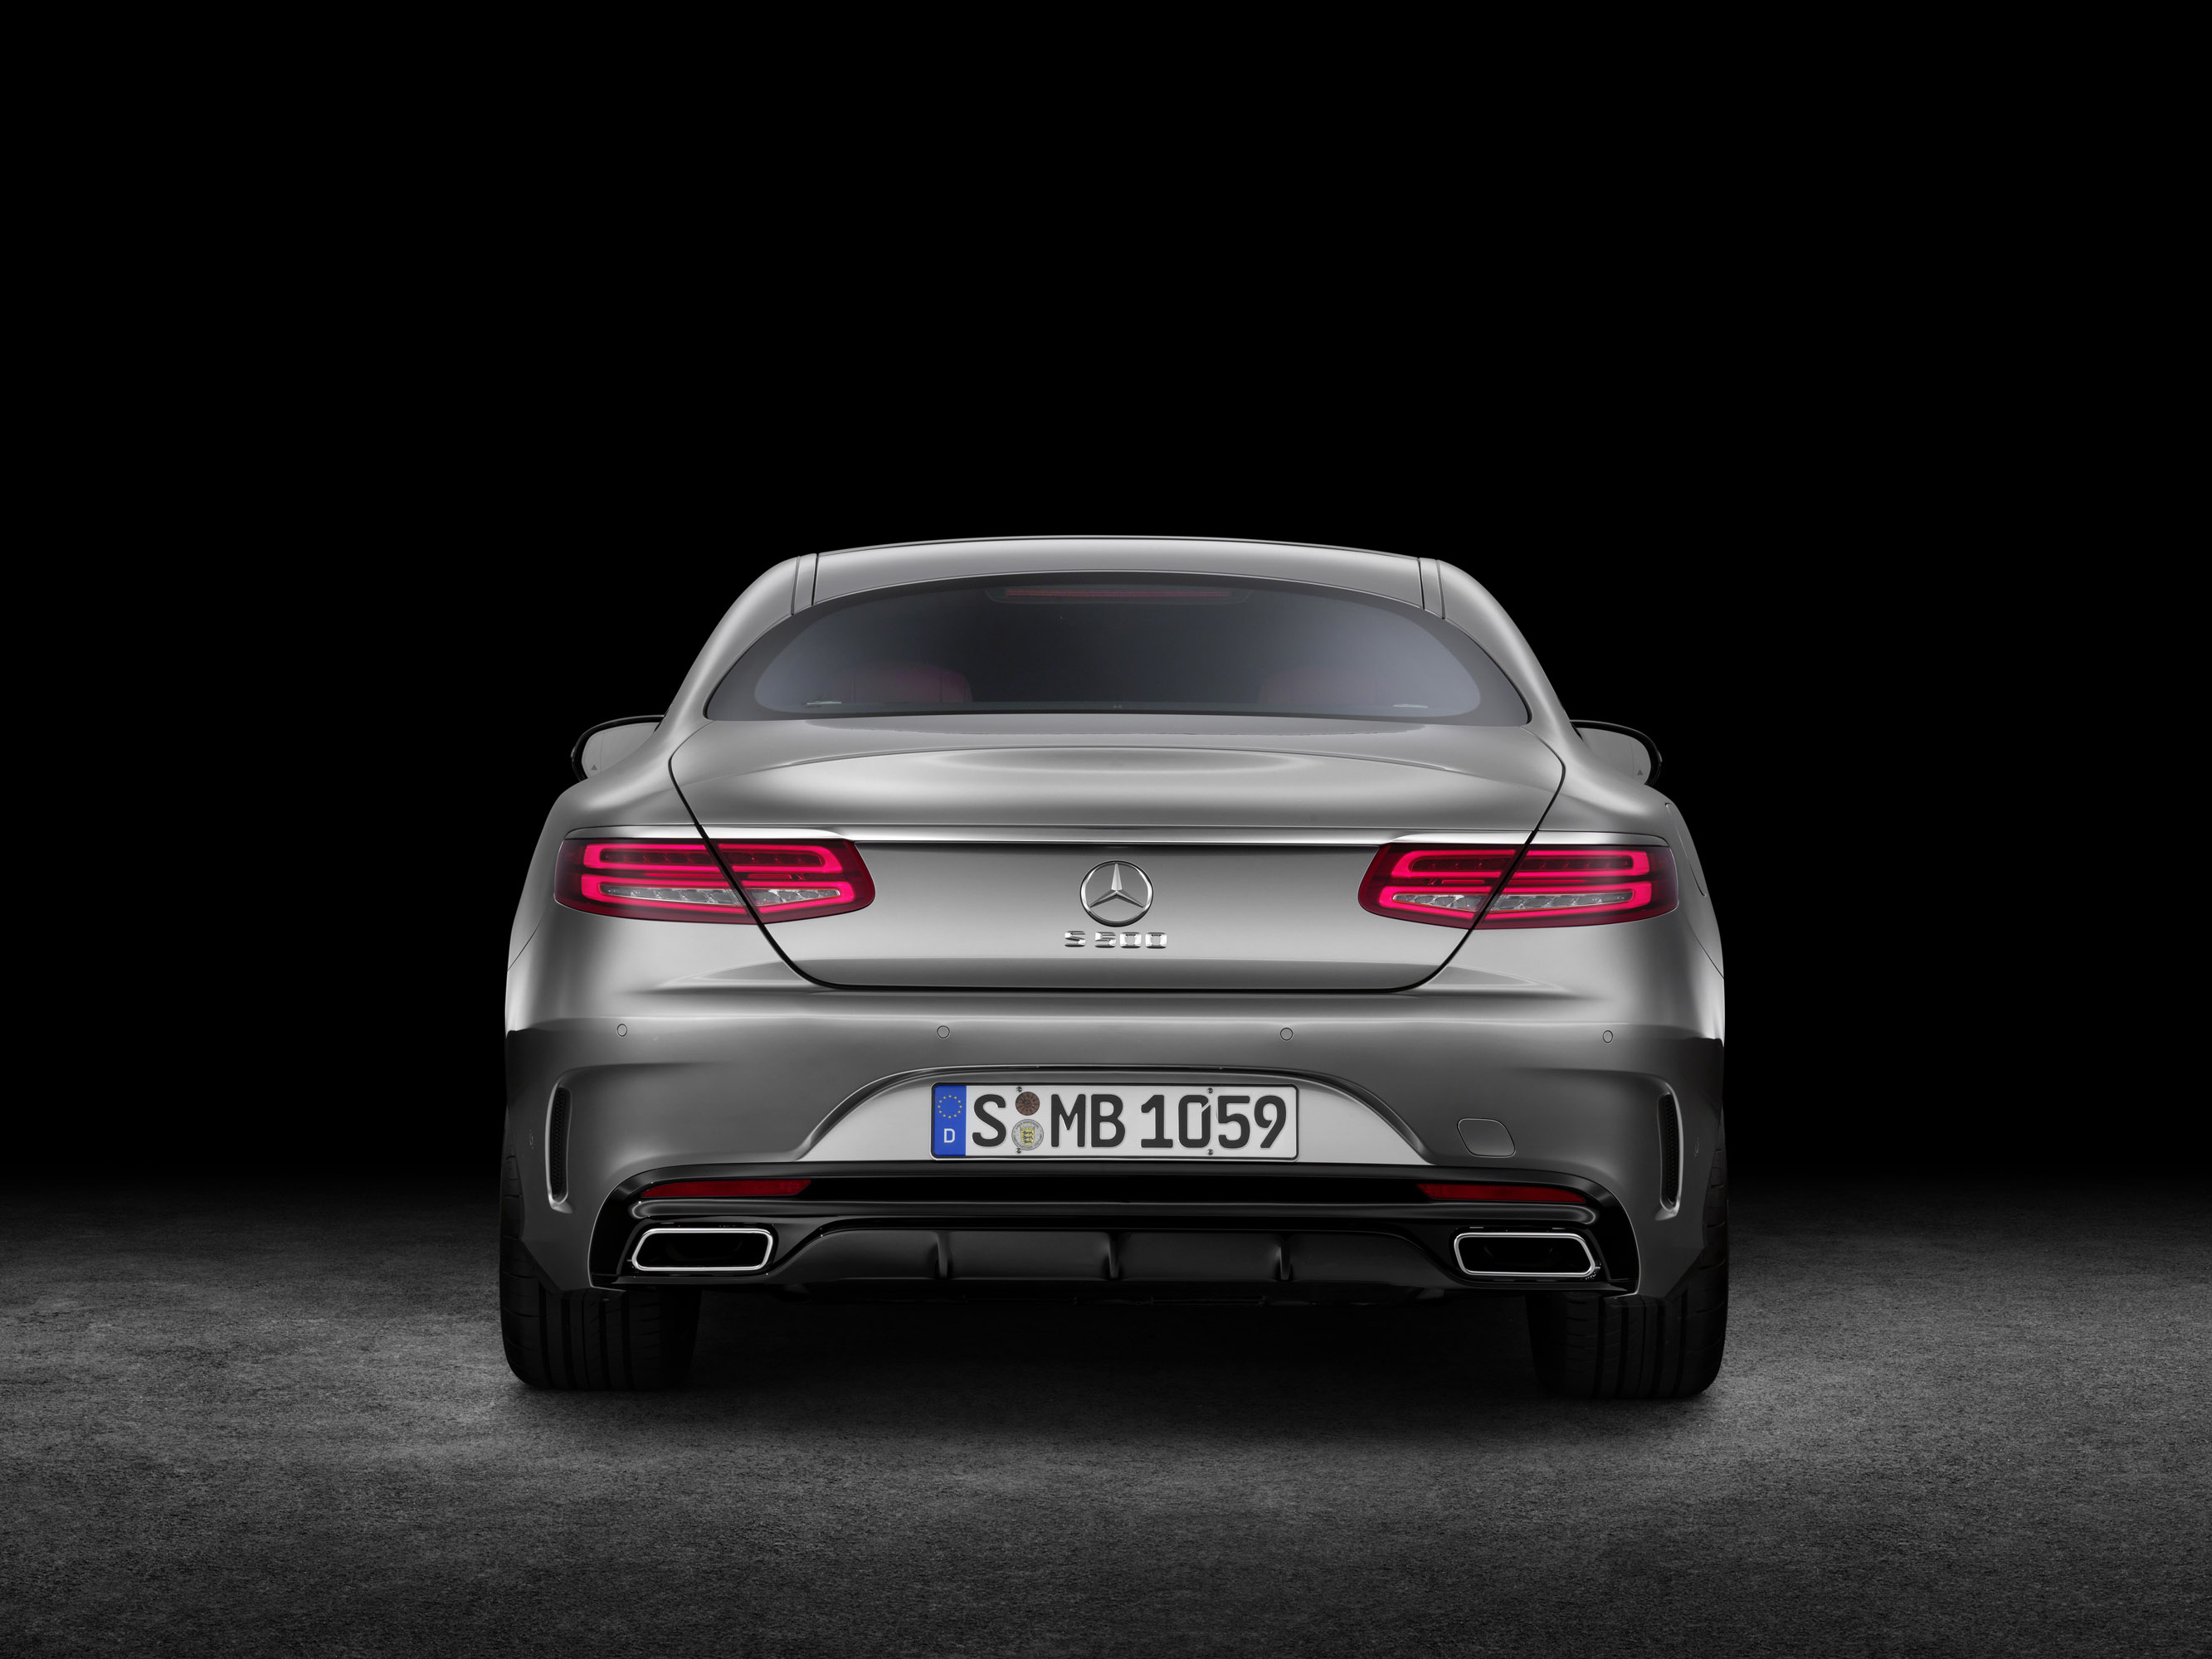 https://www.automobilesreview.com/img/2015-mercedes-benz-s-class-coupe/2015-mercedes-benz-s-class-coupe-04.jpg